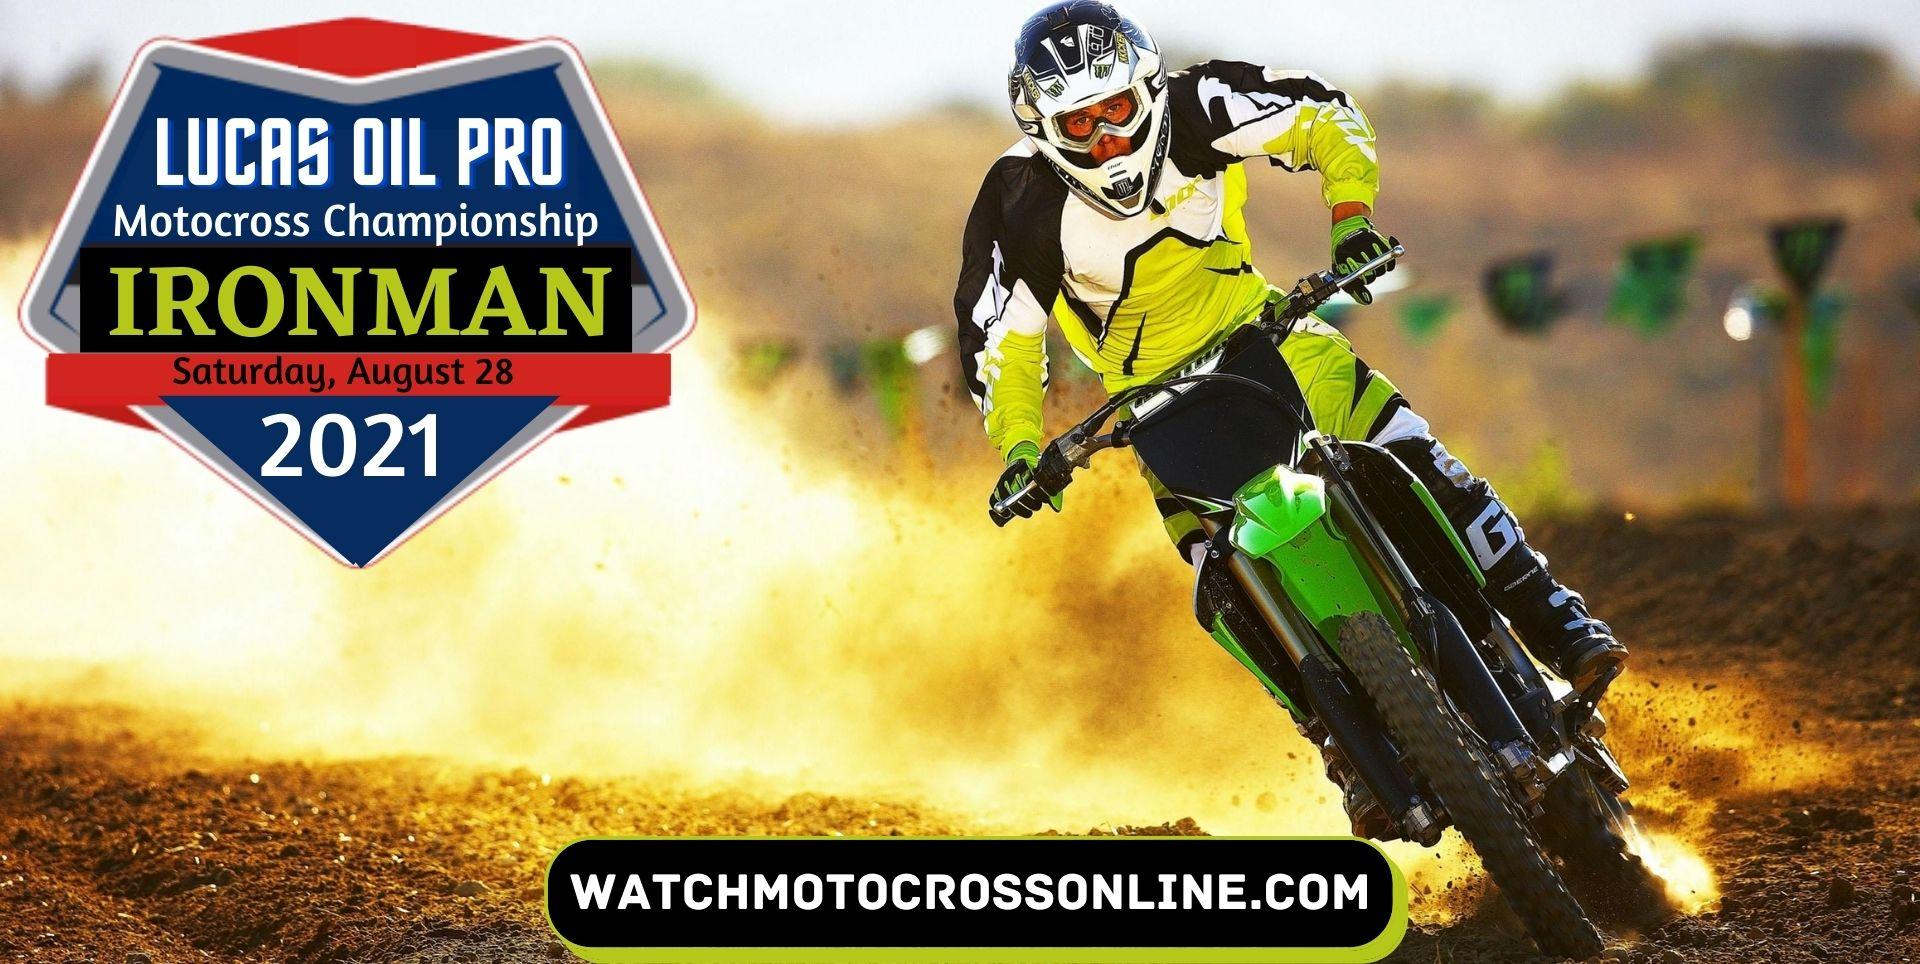 Ironman Motocross Live Stream 2021